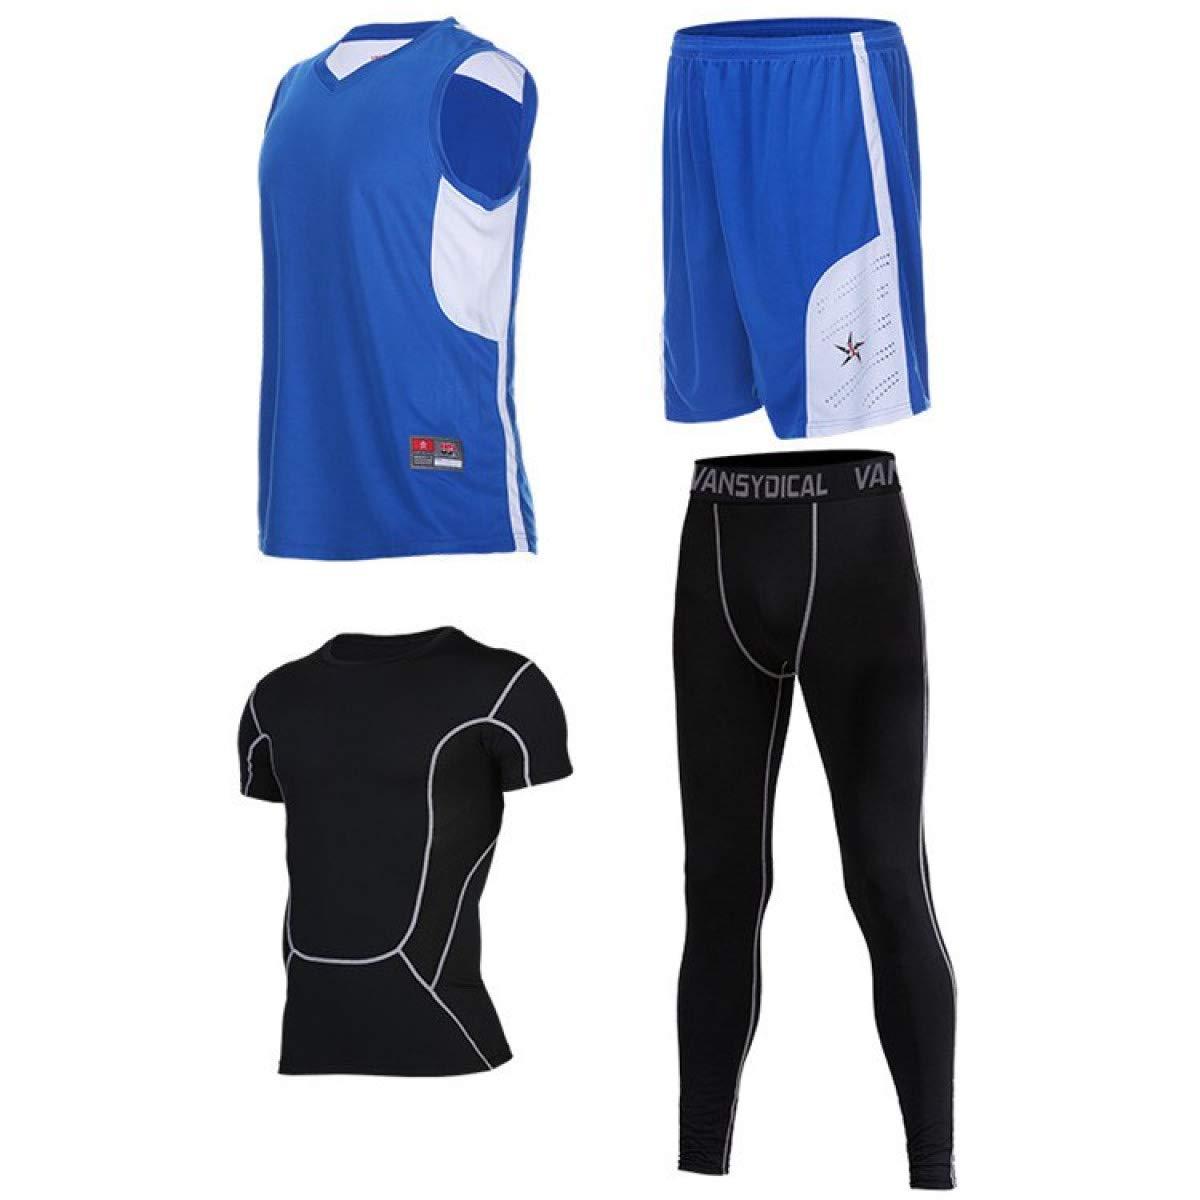 info for e1587 9e1a0 WEEKEND SHOP 4pcs Men's Basketball Training Suit Basketball ...